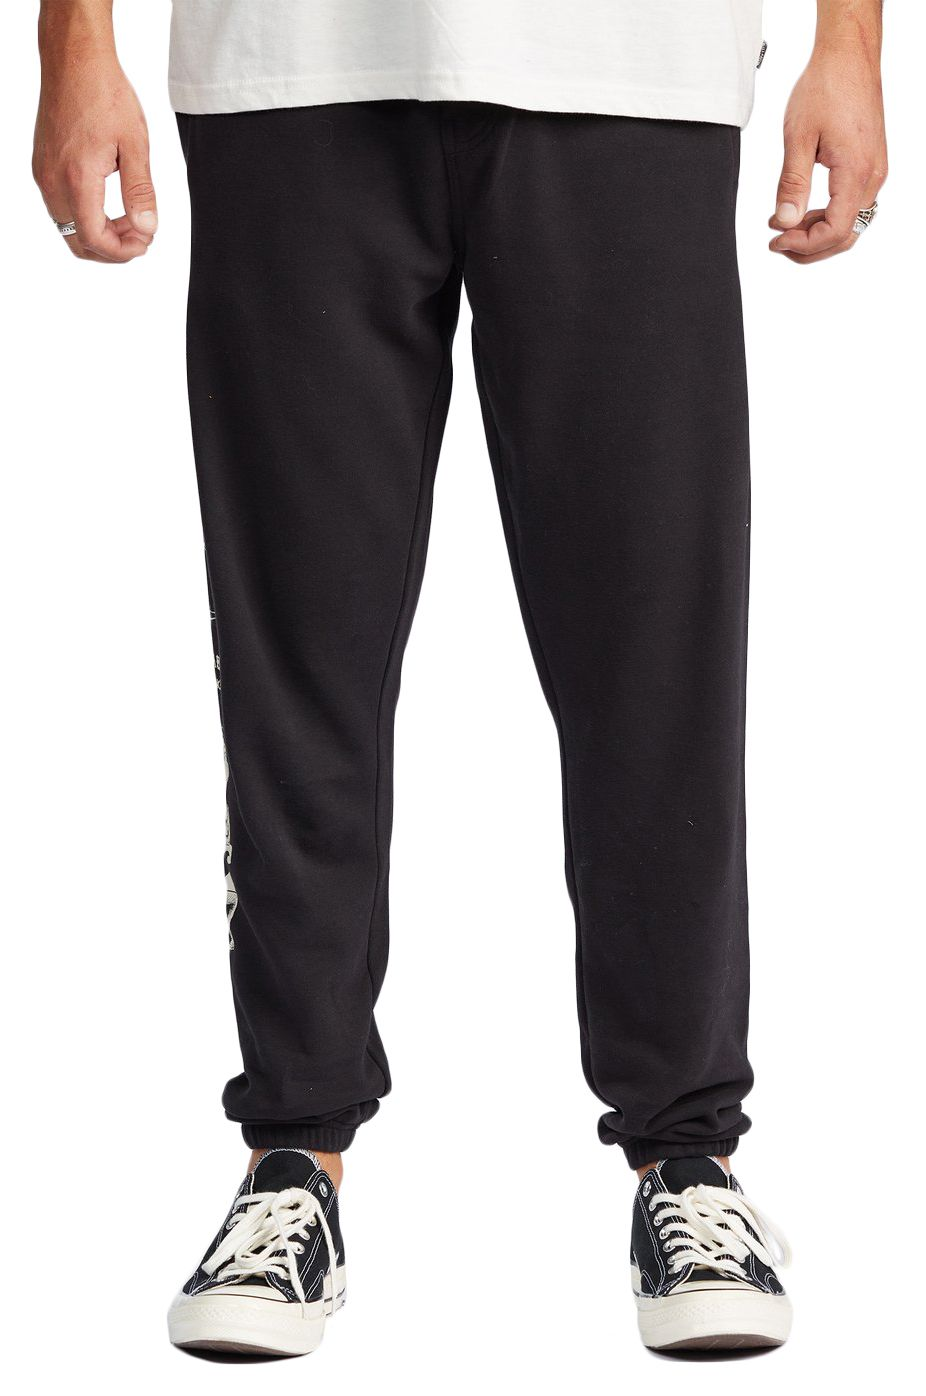 Billabong Pants GRINCH VACATION DR SEUSS Black